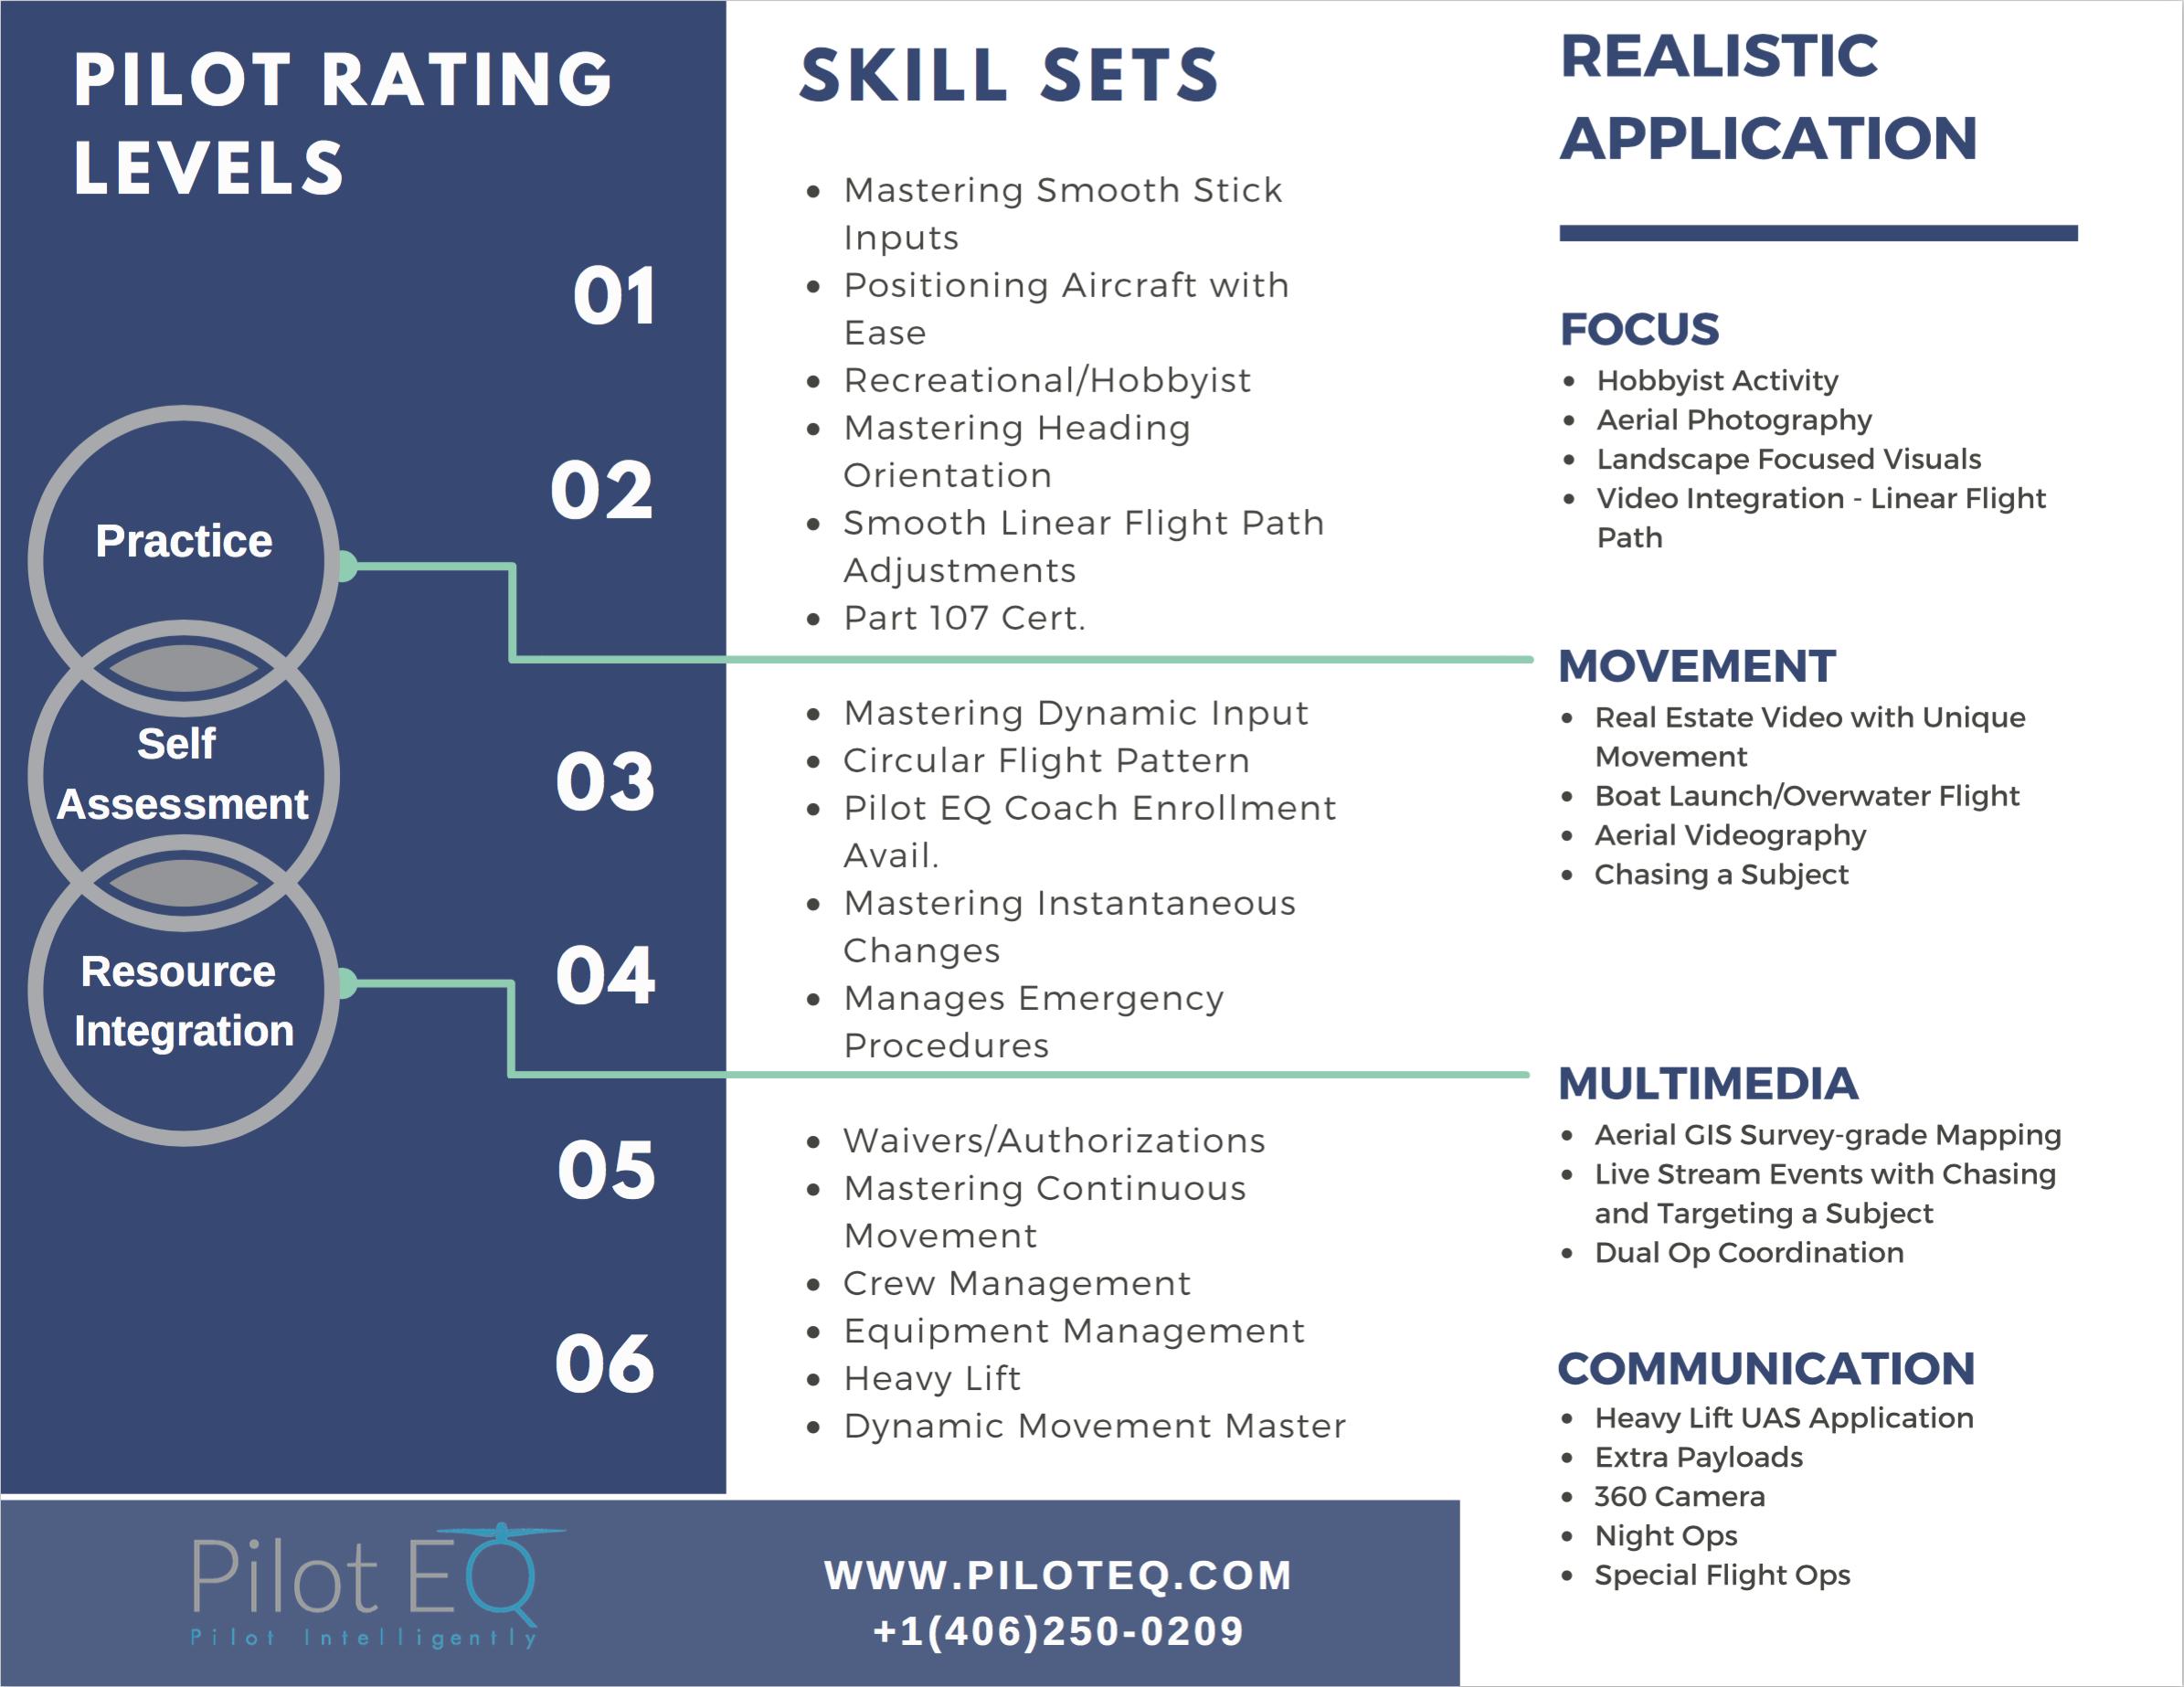 PilotRatingSystem_PilotEQ_Flight_Drone_UAS_Skills_Dronepilot